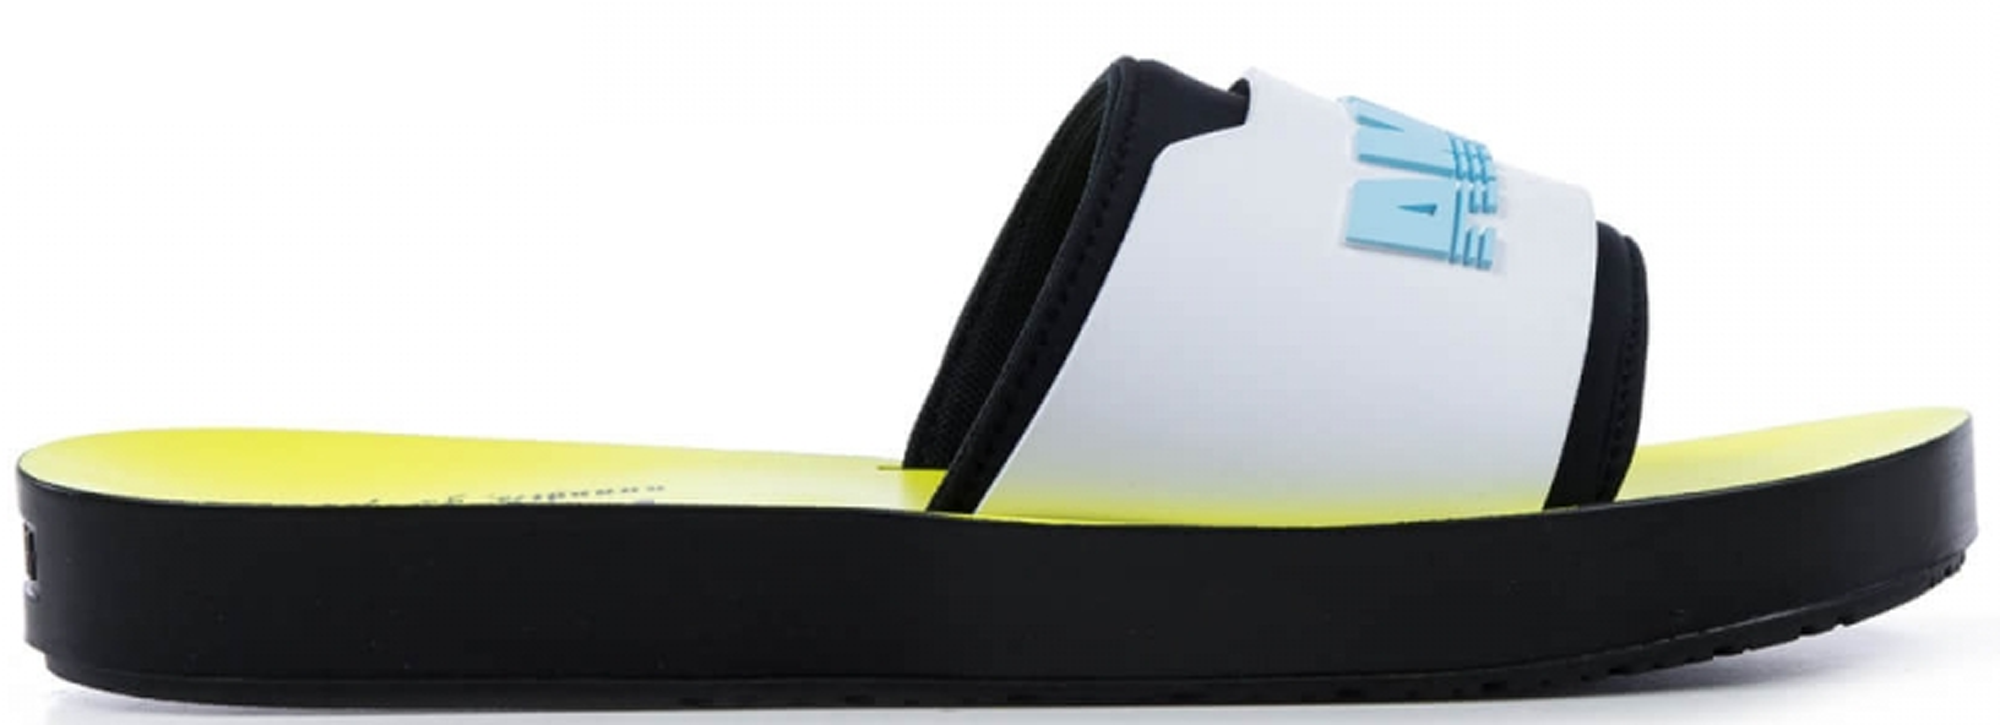 Puma Surf Slide Rihanna Fenty Black White Yellow (W)